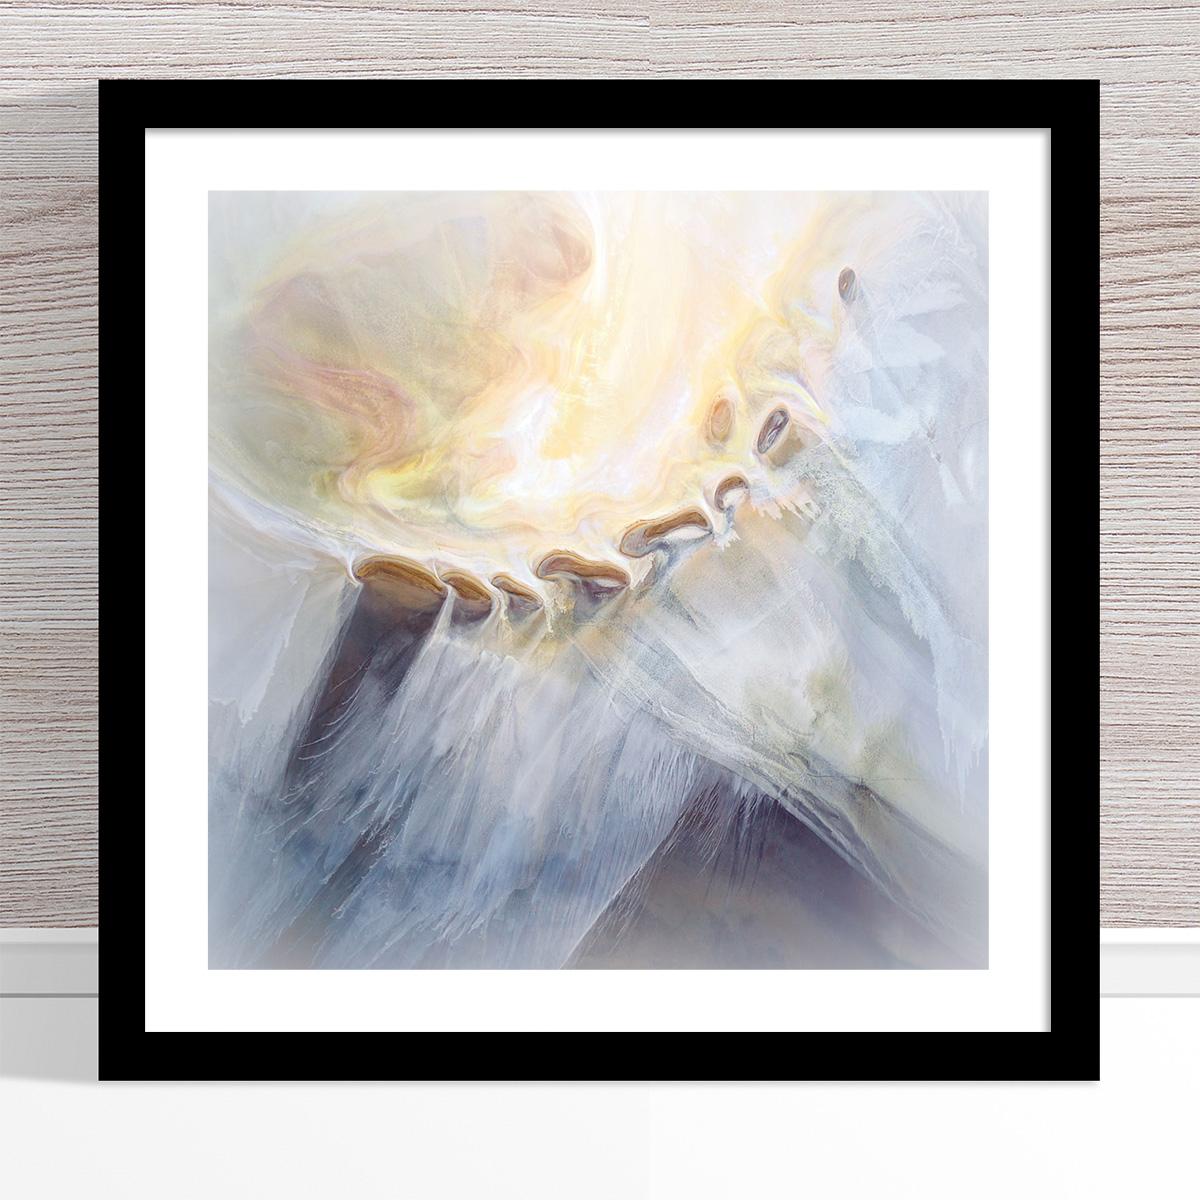 Chris Saunders - 'Aerial Salt 018' Black Frame